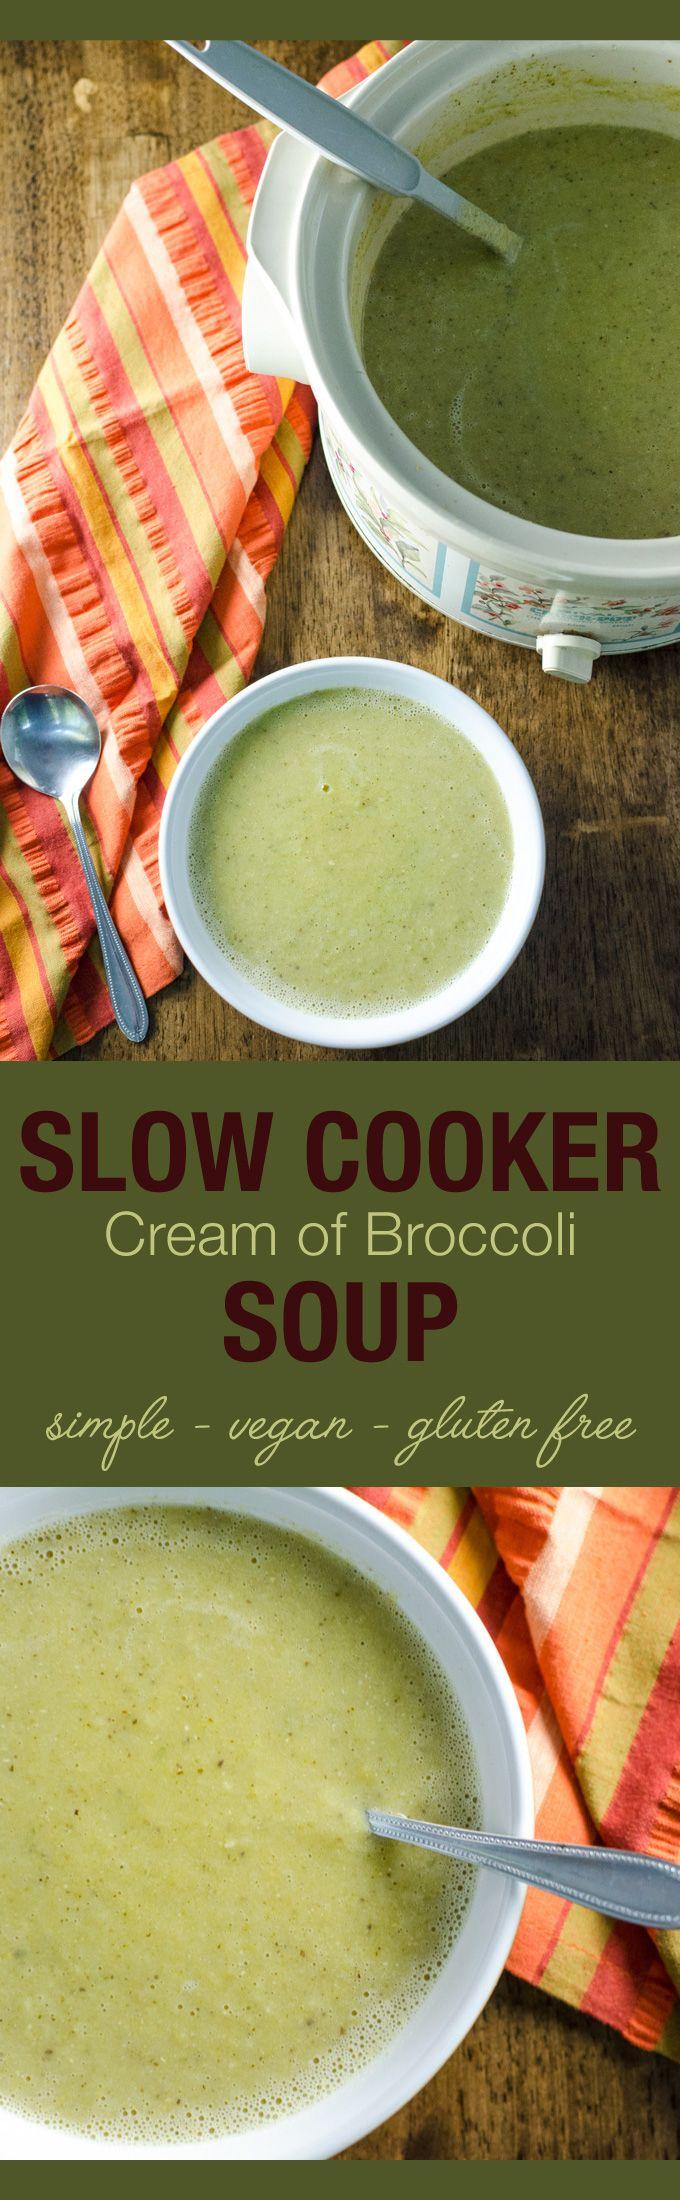 Slow Cooker Cream of Broccoli Soup - a simple vegan and gluten free crock pot recipe made primarily with frozen veggies! | VeggiePrimer.com